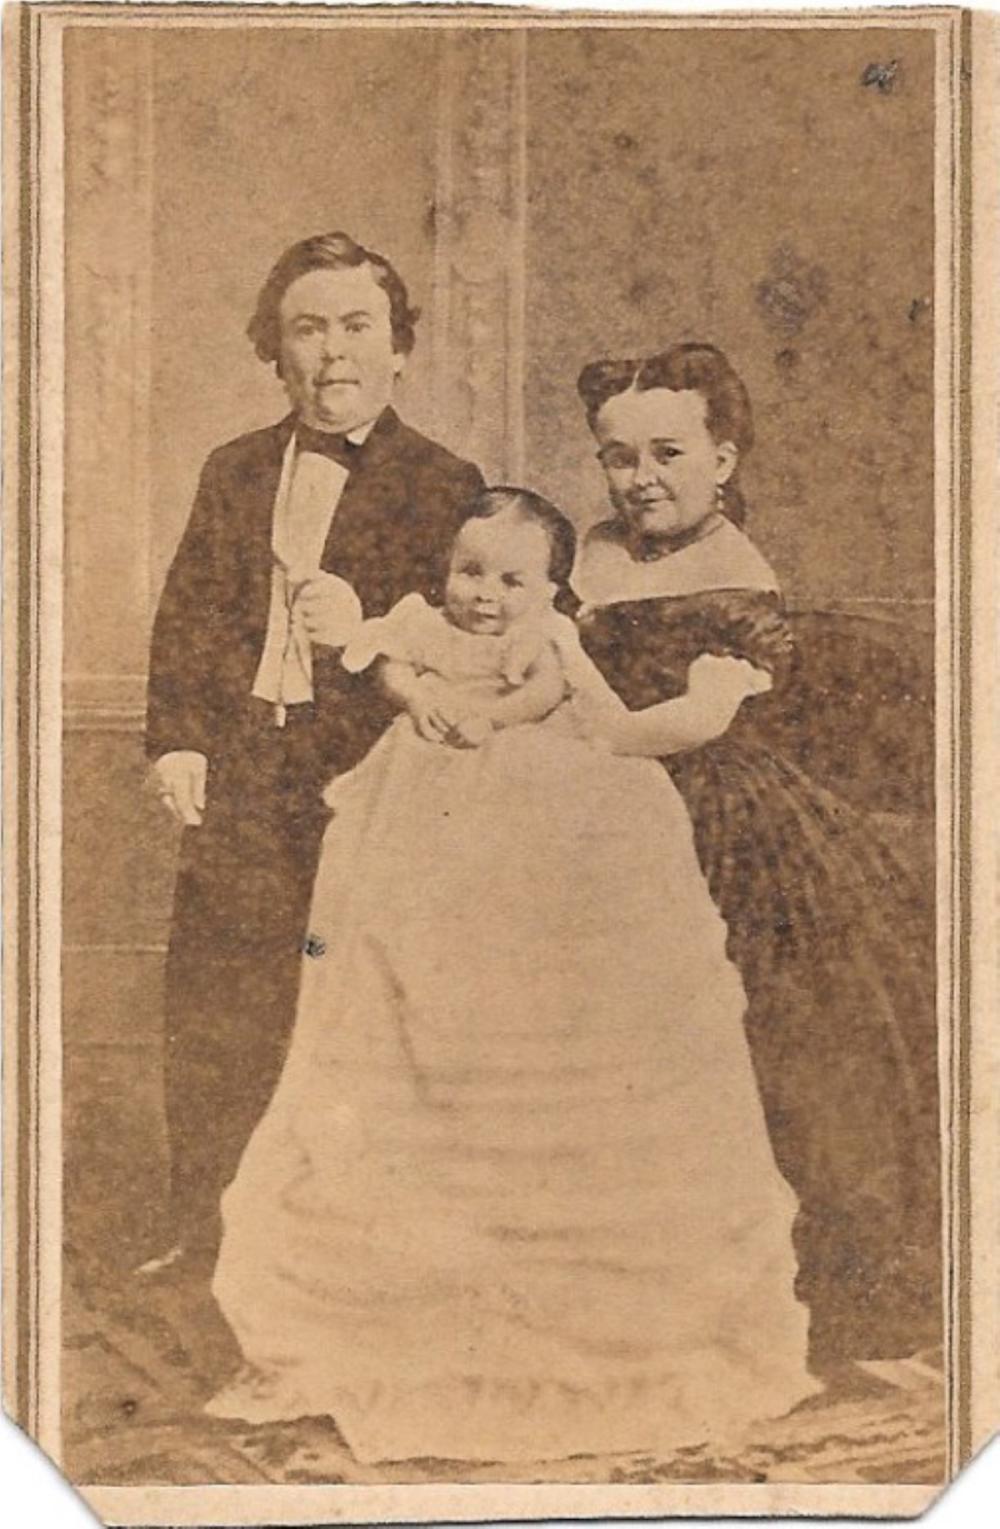 General Tom Thumb and family, PT Barnum CDV